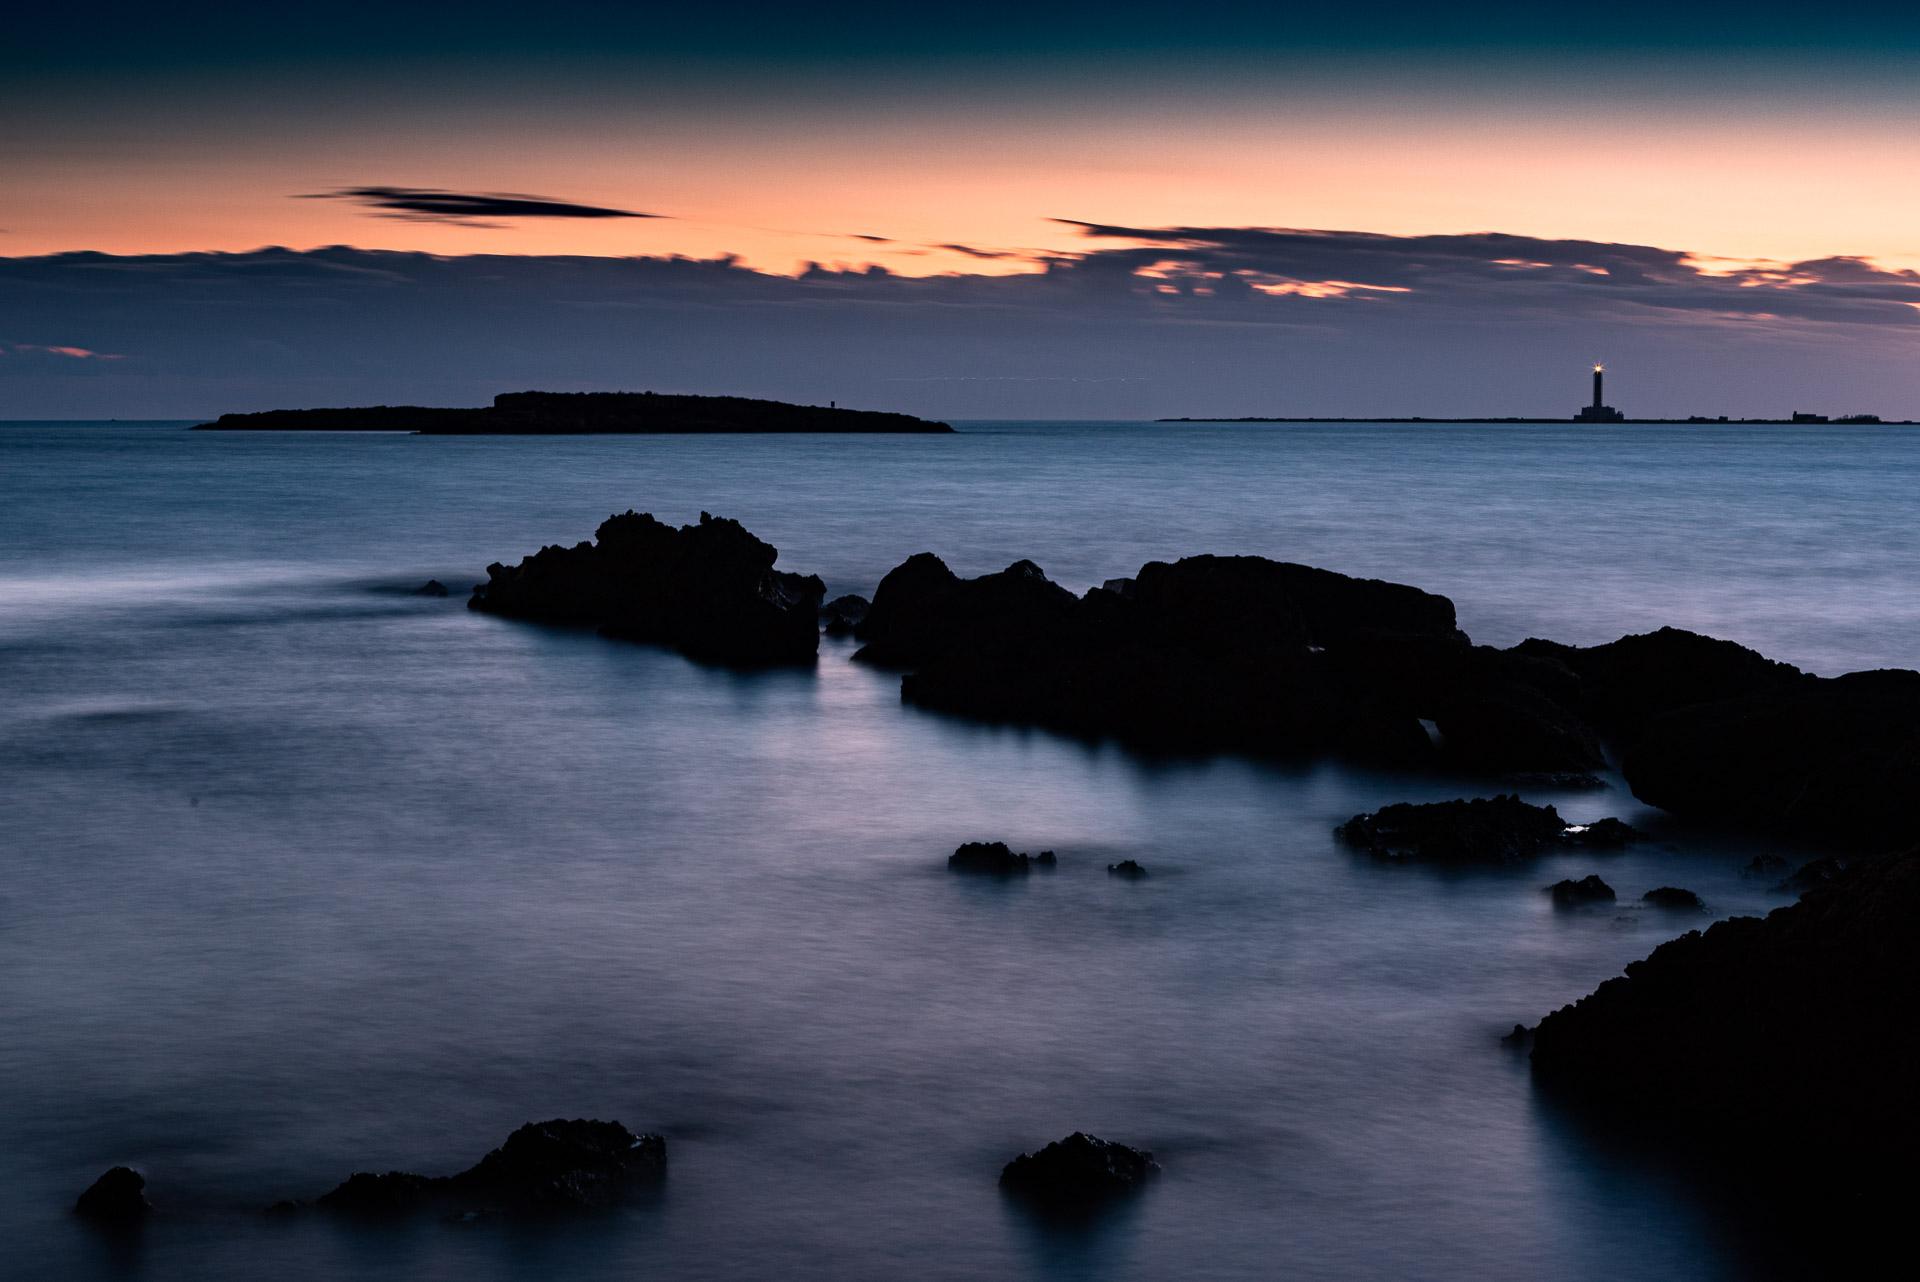 Gallipoli, seascape long exposure photography